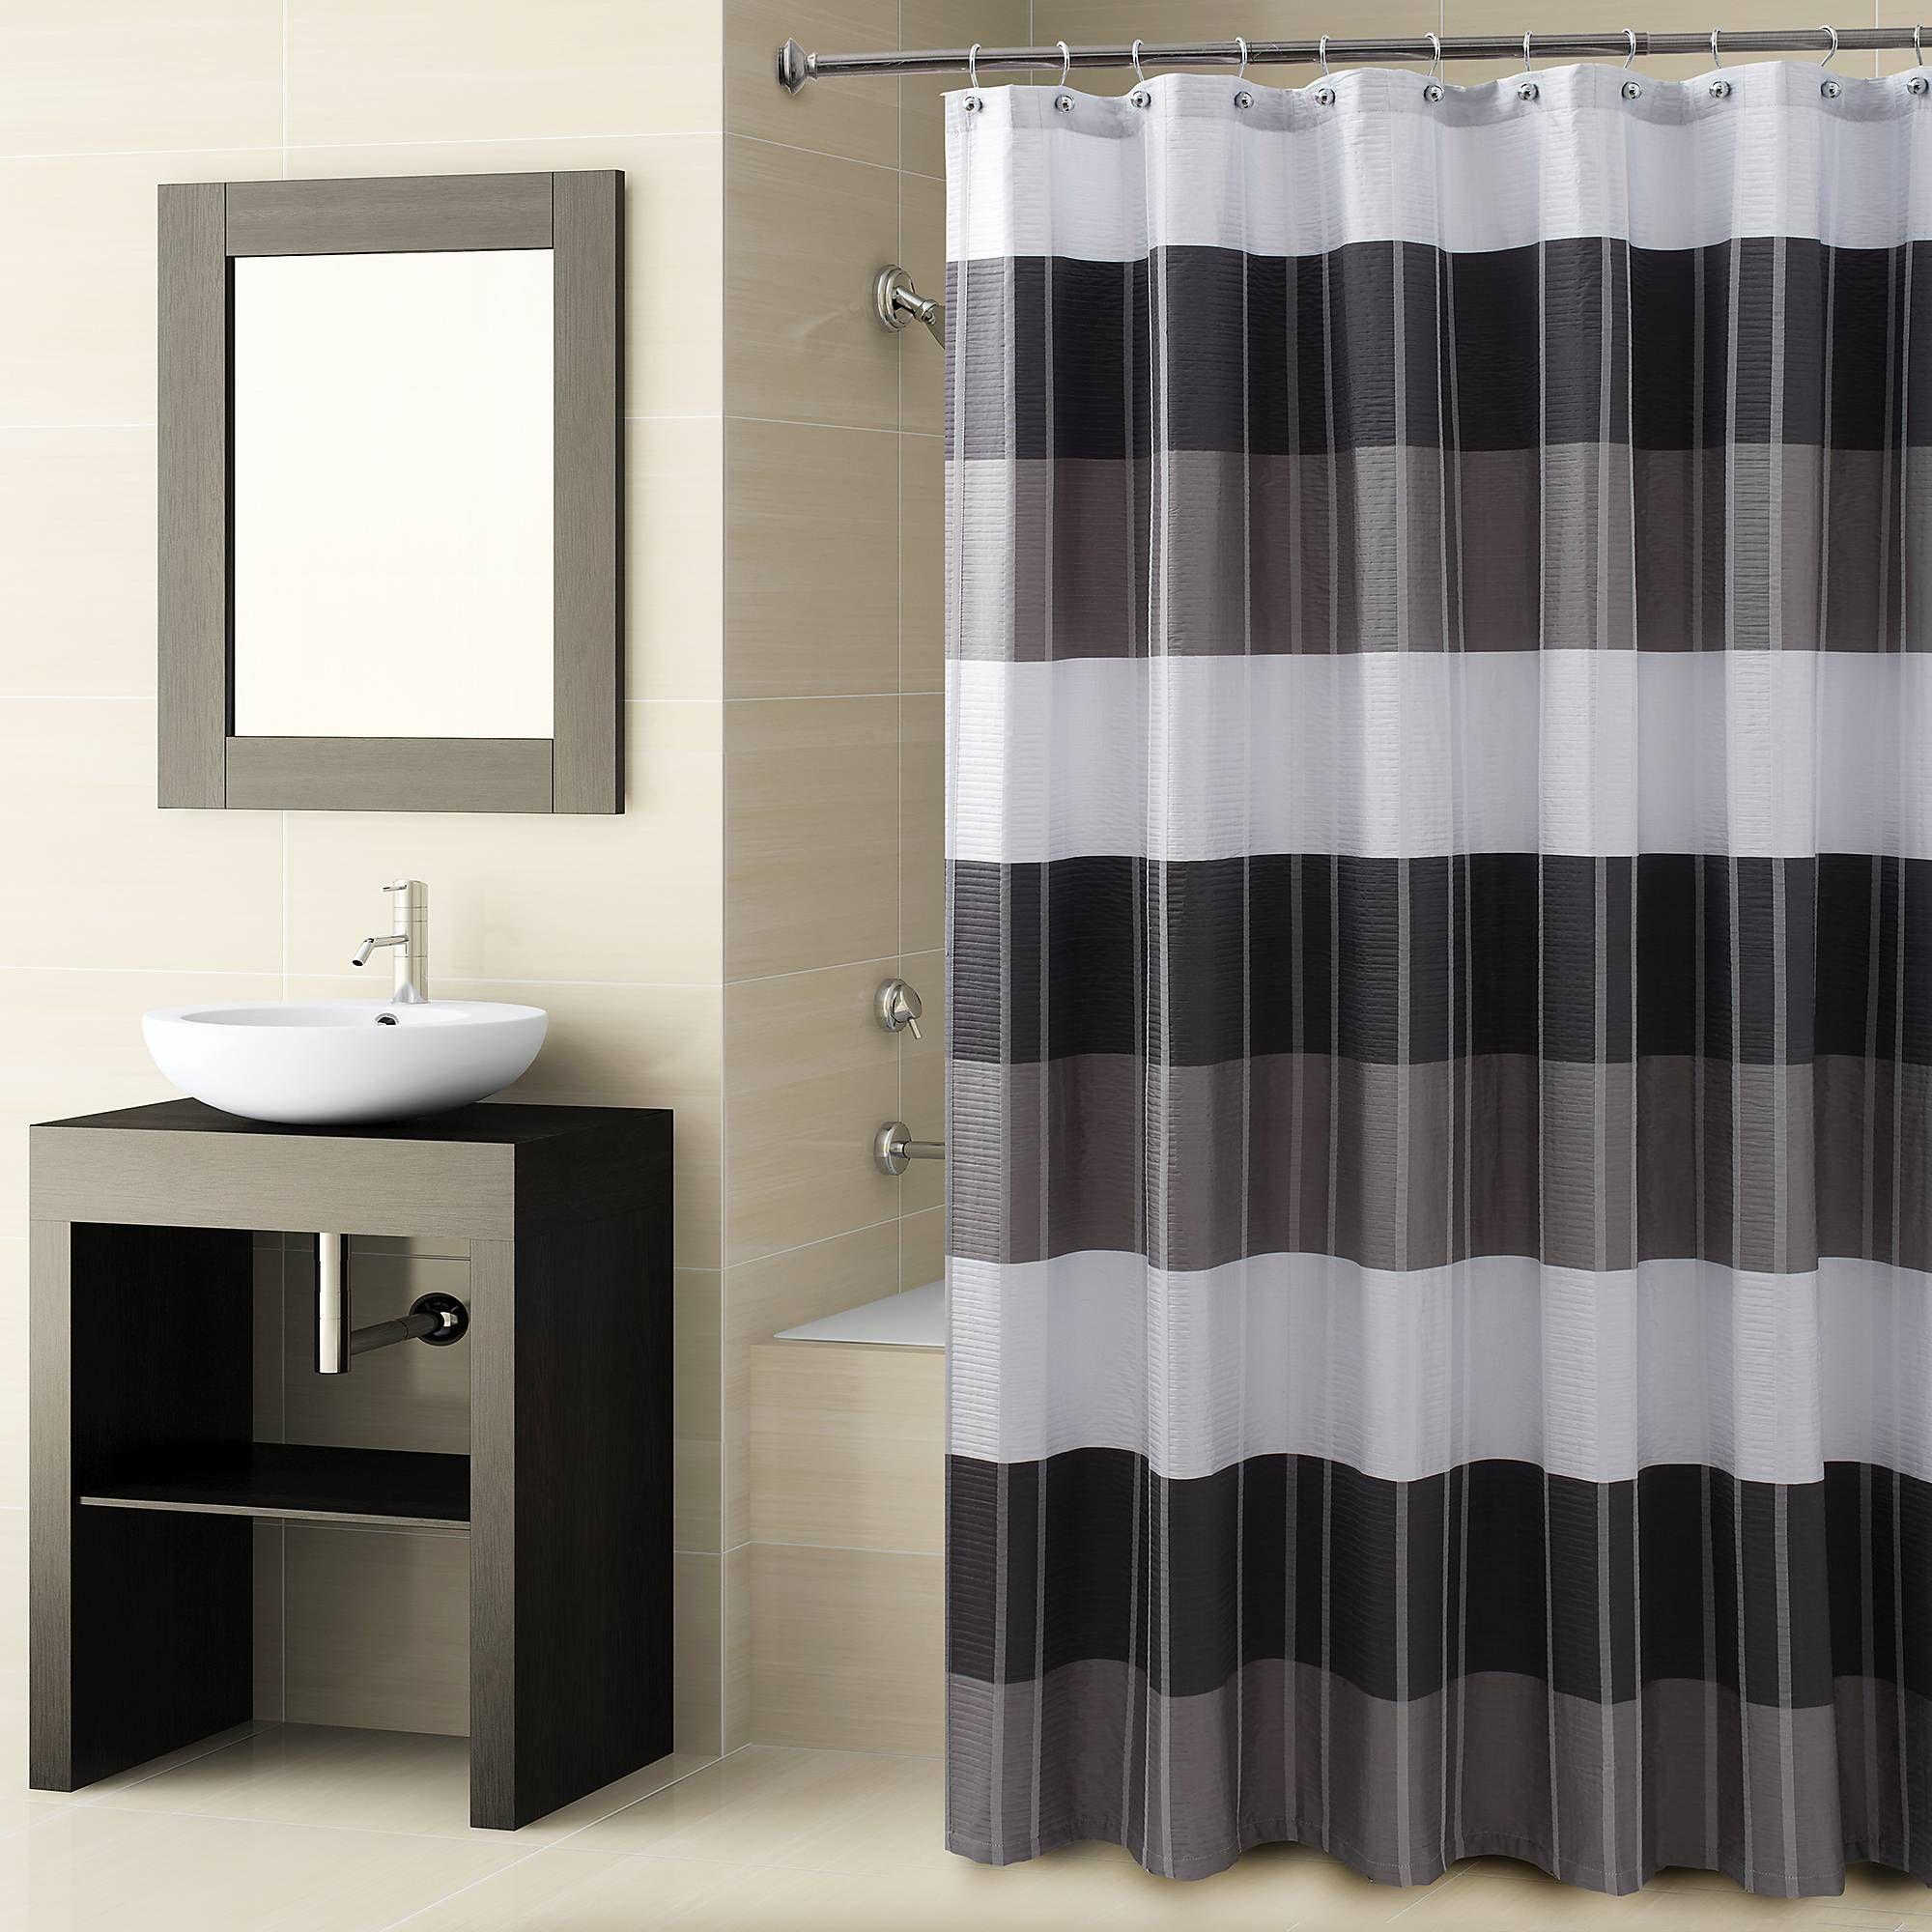 Croscill Fairfax Shower Curtain Black Shower Curtains Fabric Shower Curtains Shower Curtain Sets